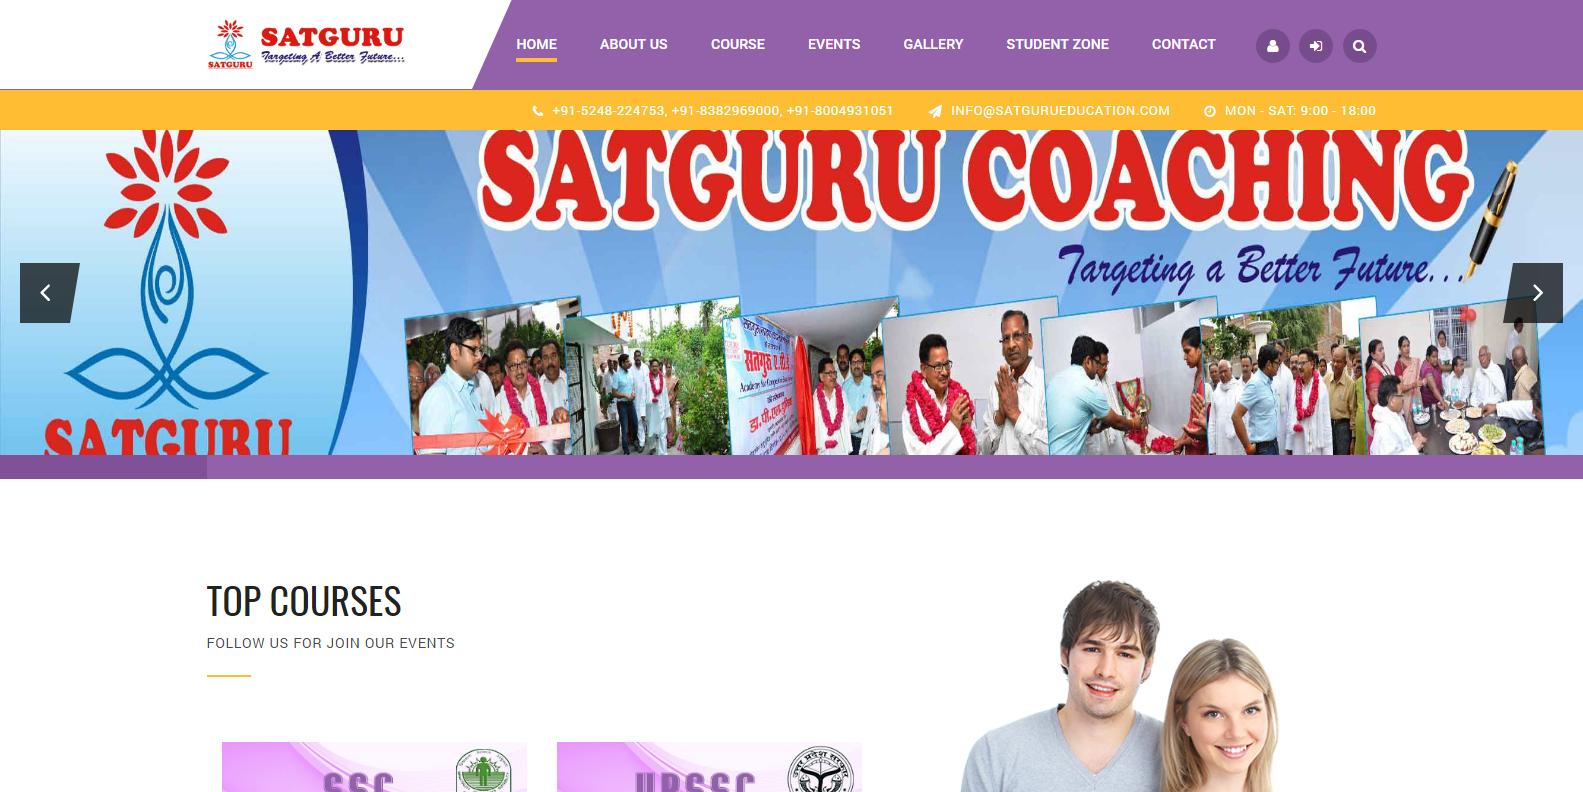 Satguru Coaching